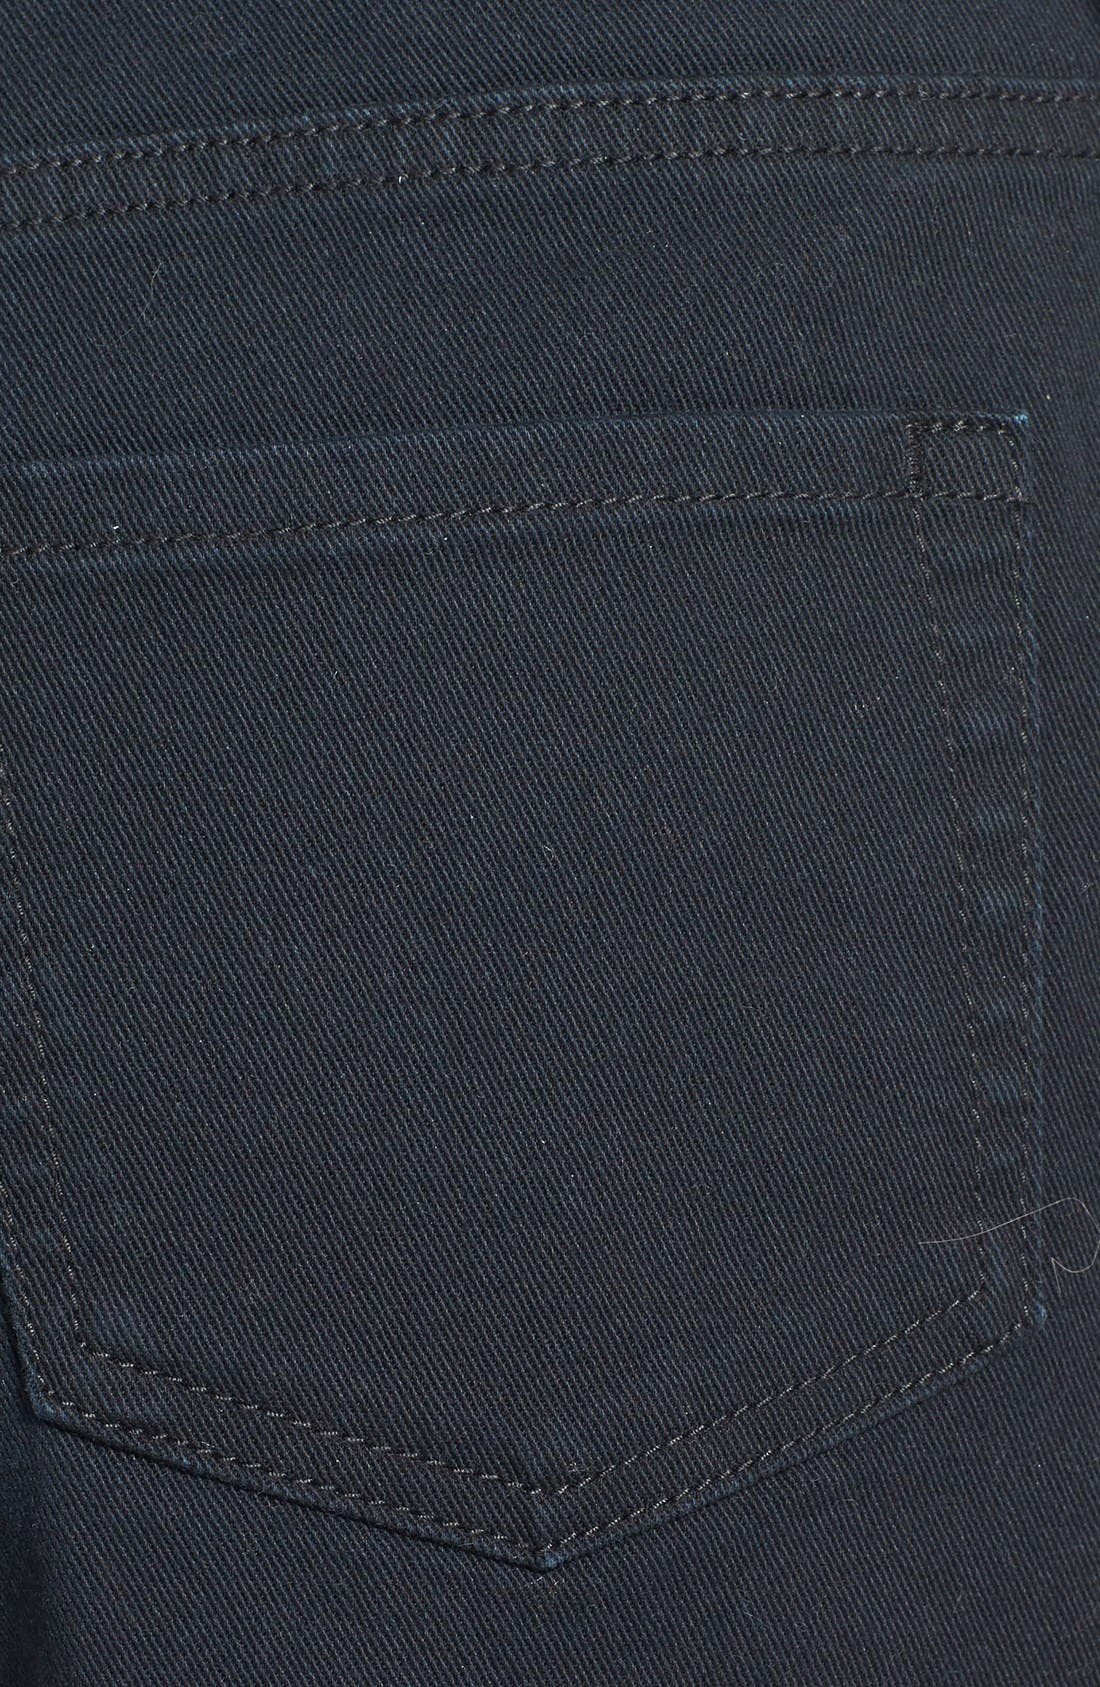 Alternate Image 3  - BP. High Waist Denim Cutoff Shorts (Juniors)